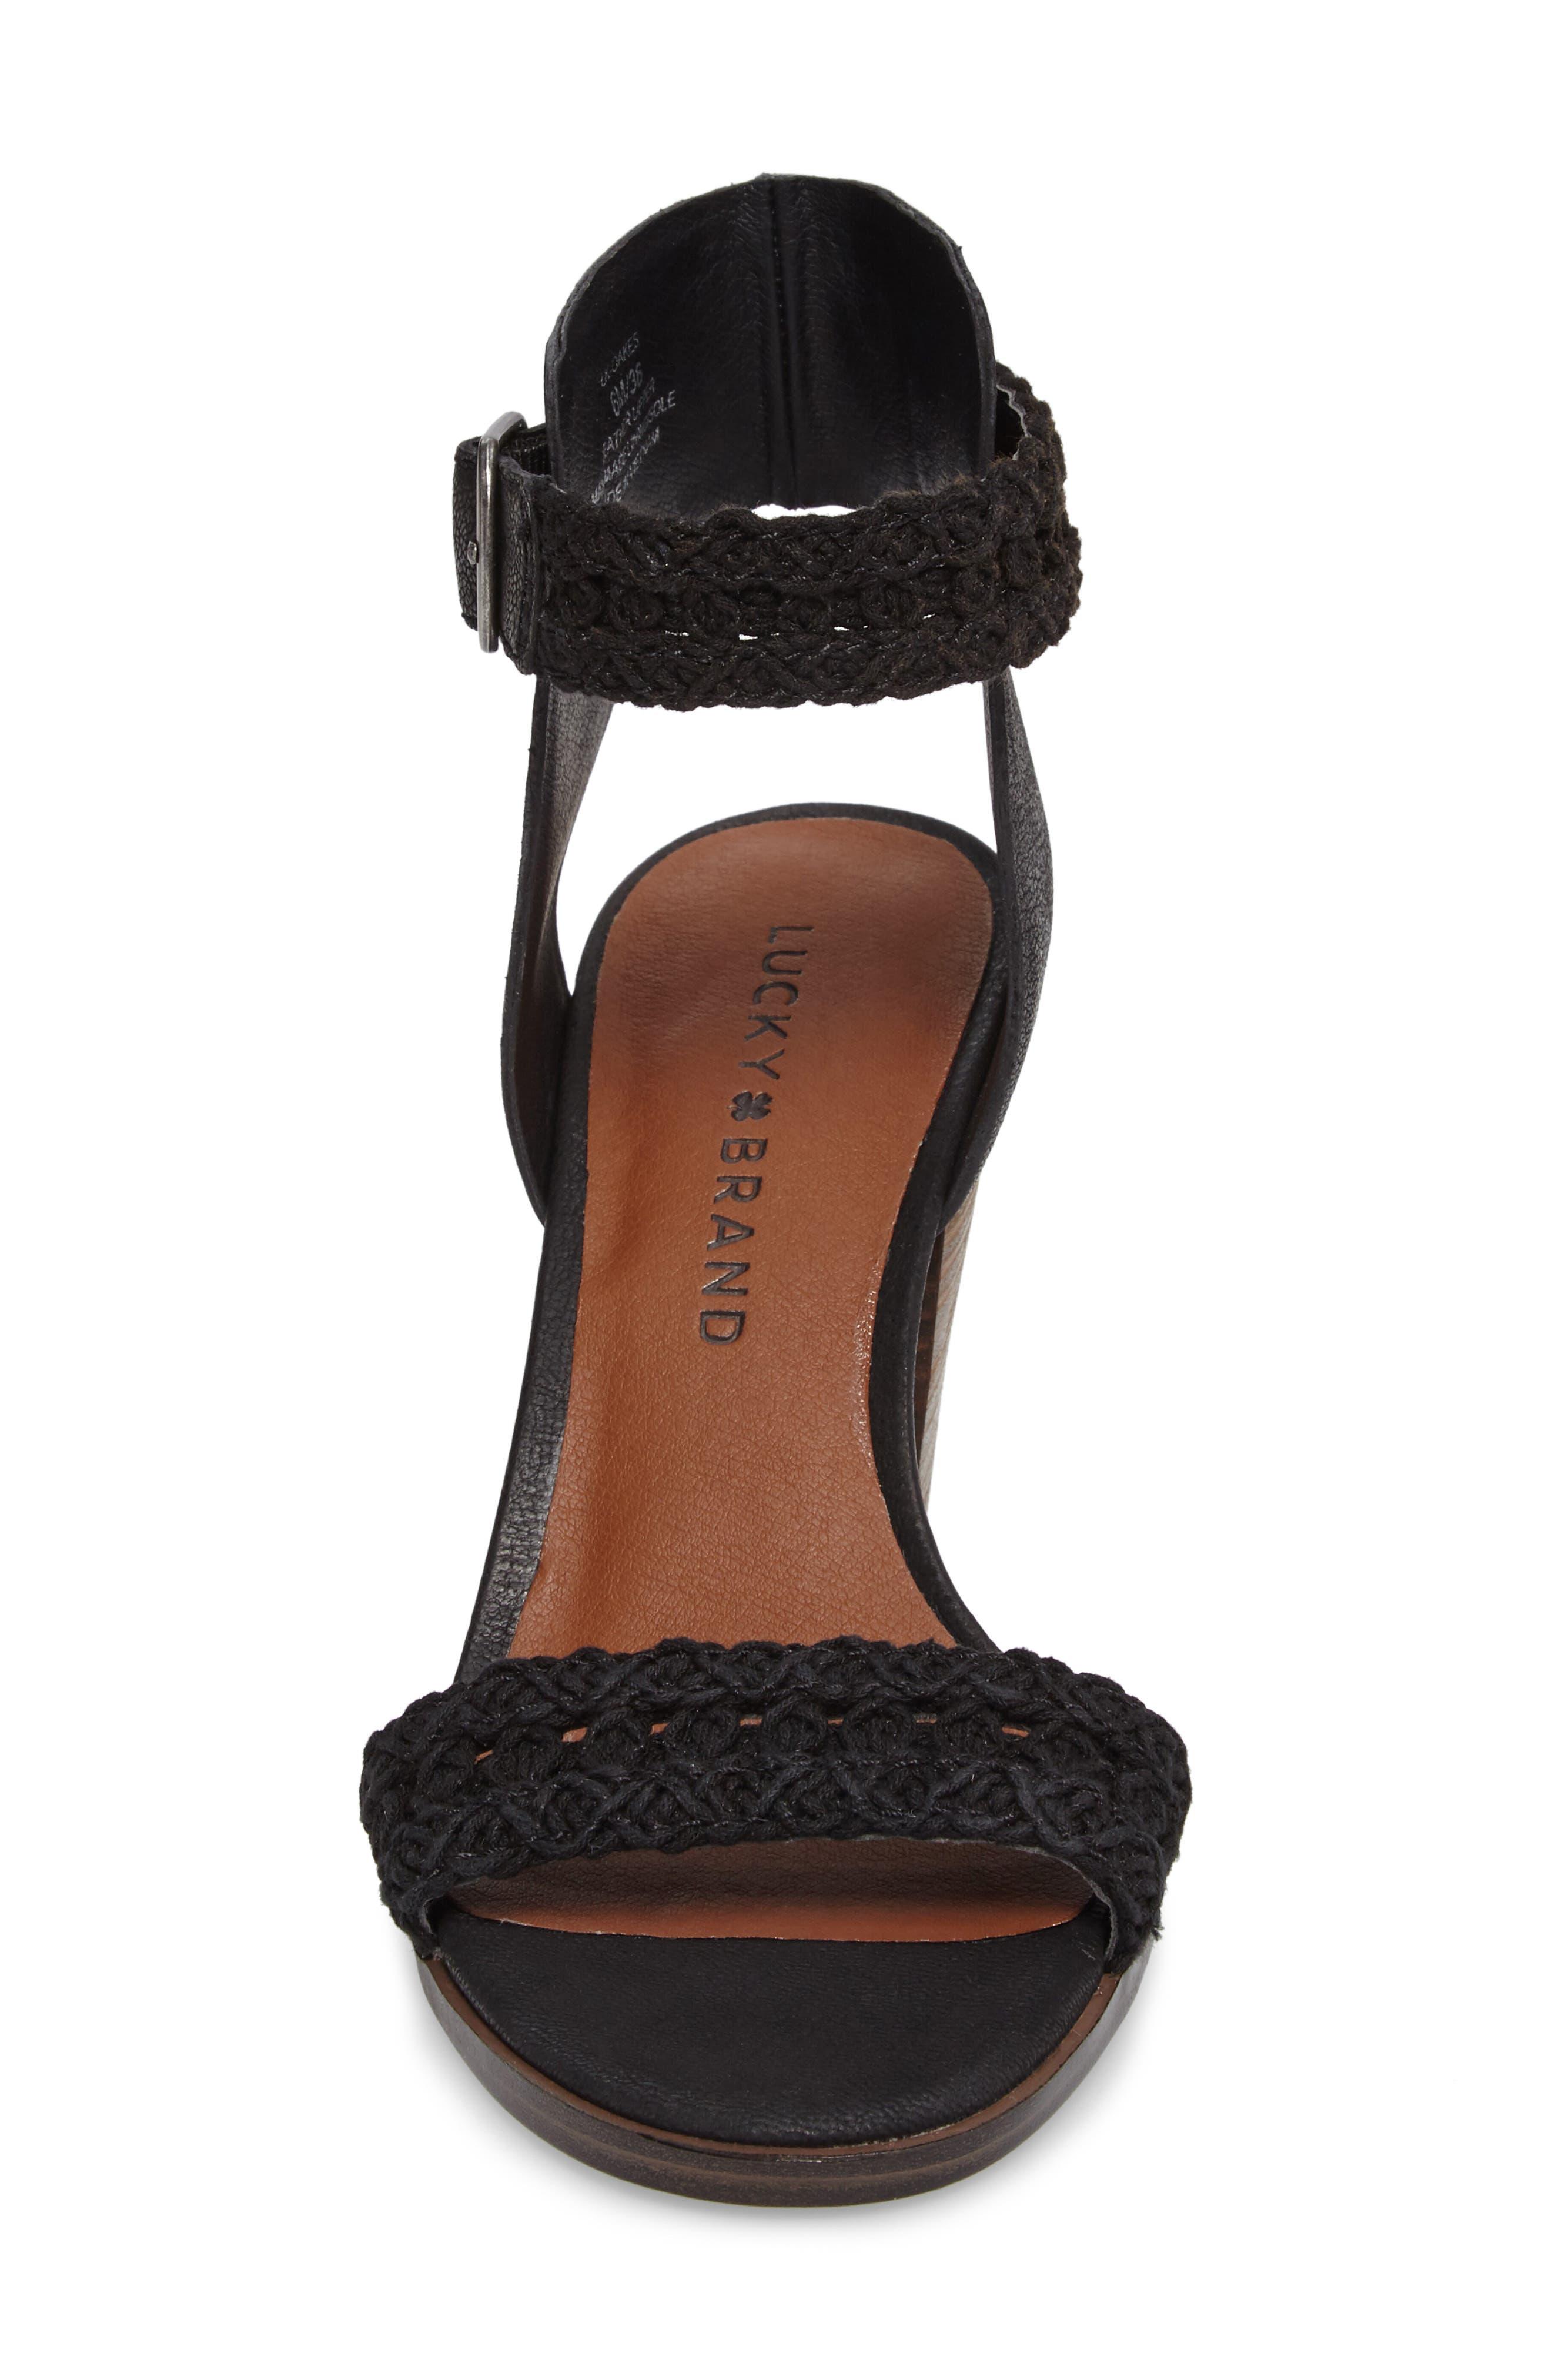 Oakes Ankle Strap Sandal,                             Alternate thumbnail 4, color,                             Black Leather